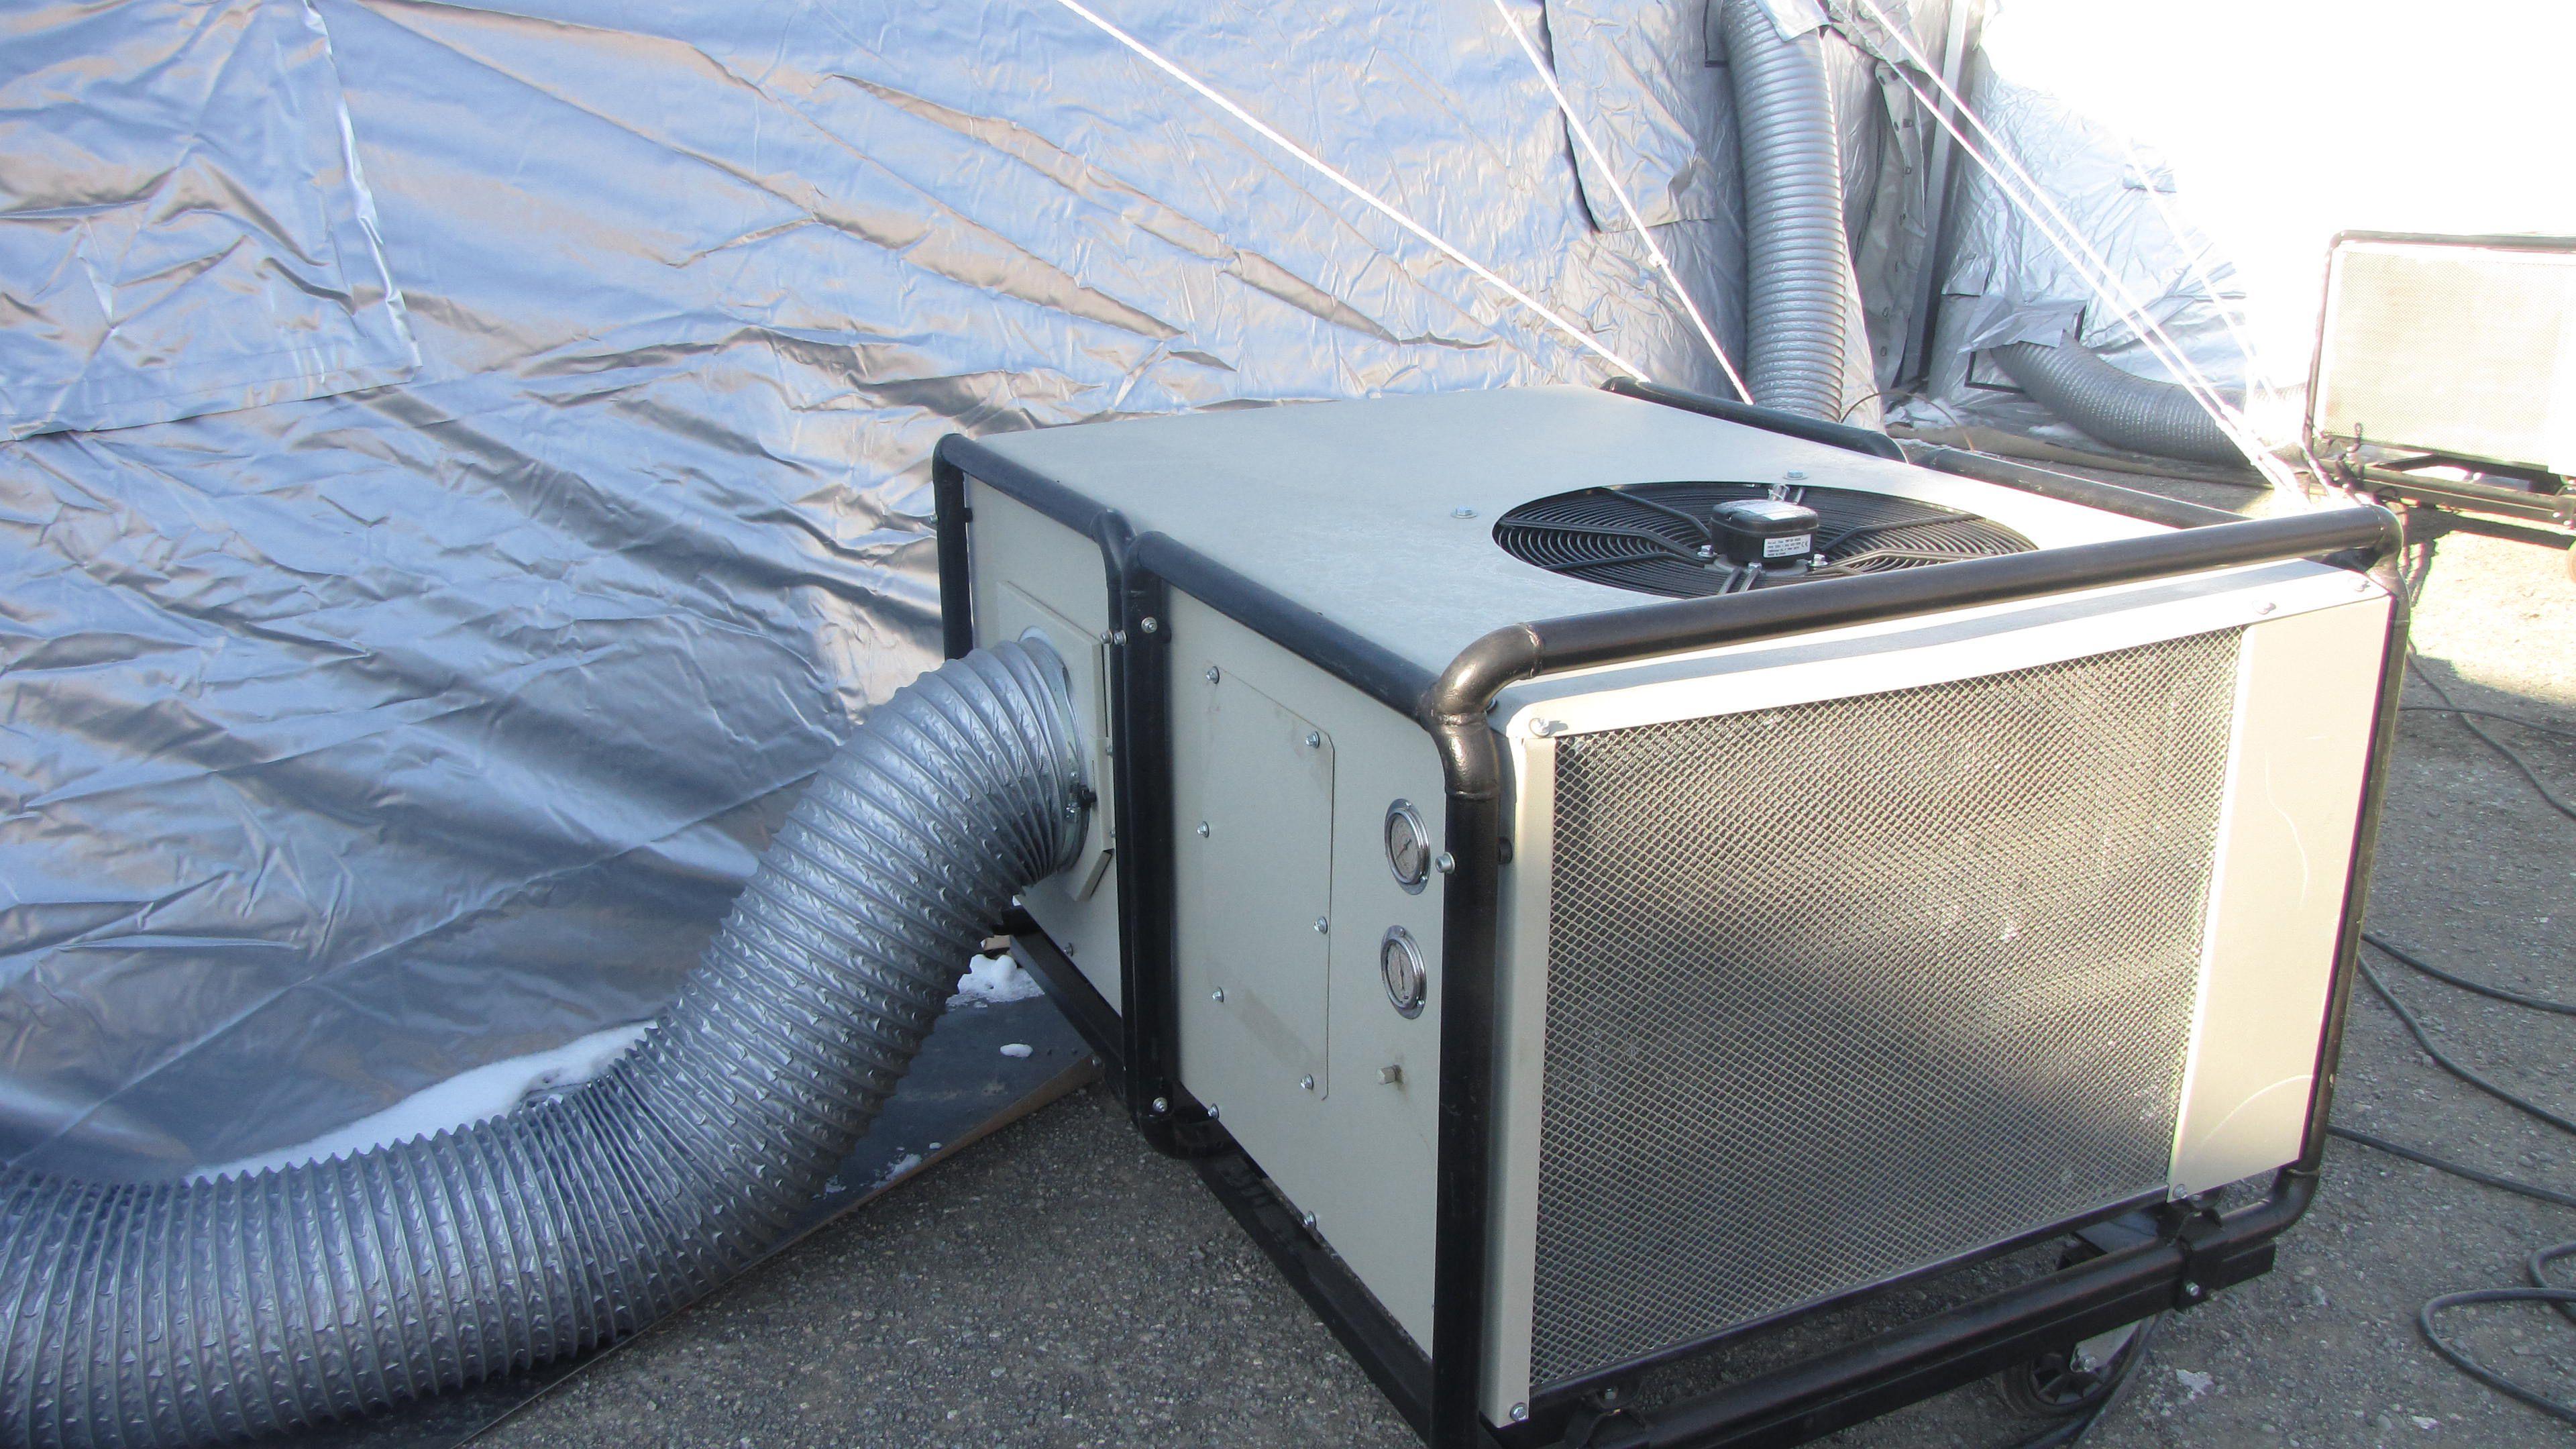 Portable Tent Air Conditioner >> Portable Tent Air Conditioner Drez 4 Ton Portable Air Conditioner